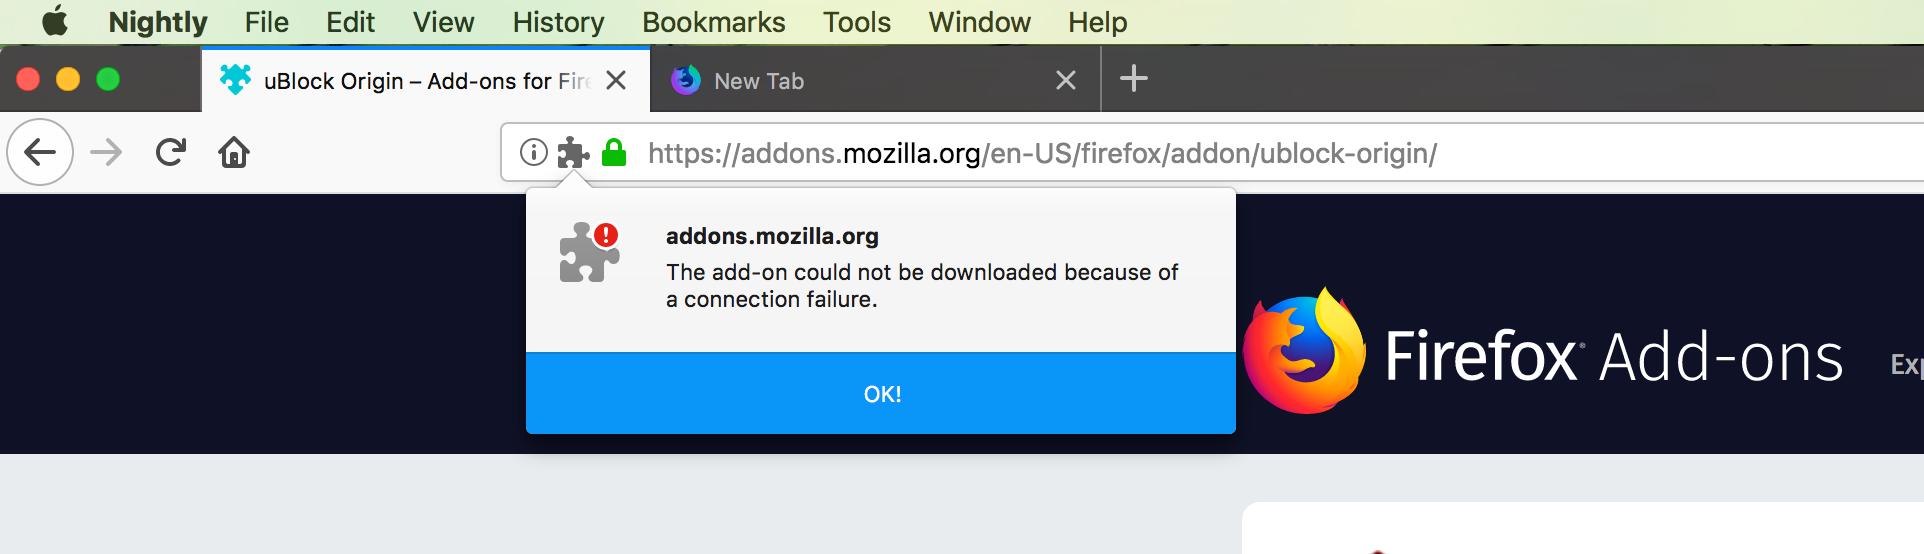 Firefox Addon Download Failure Gastronomia Y Viajes